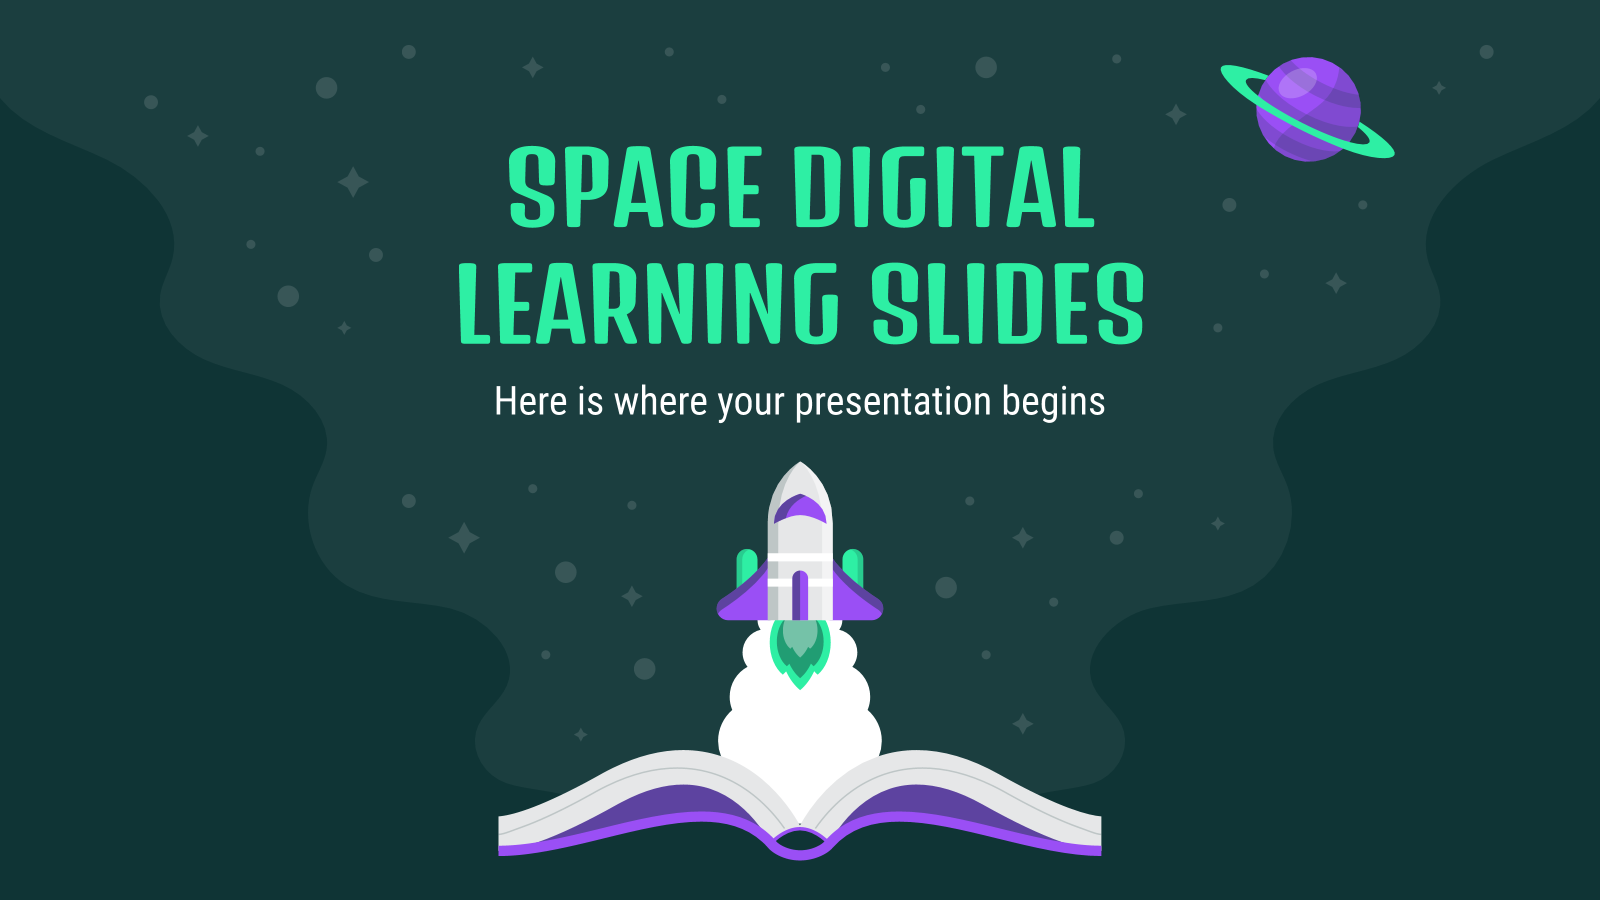 Space Digital Learning Slides presentation template